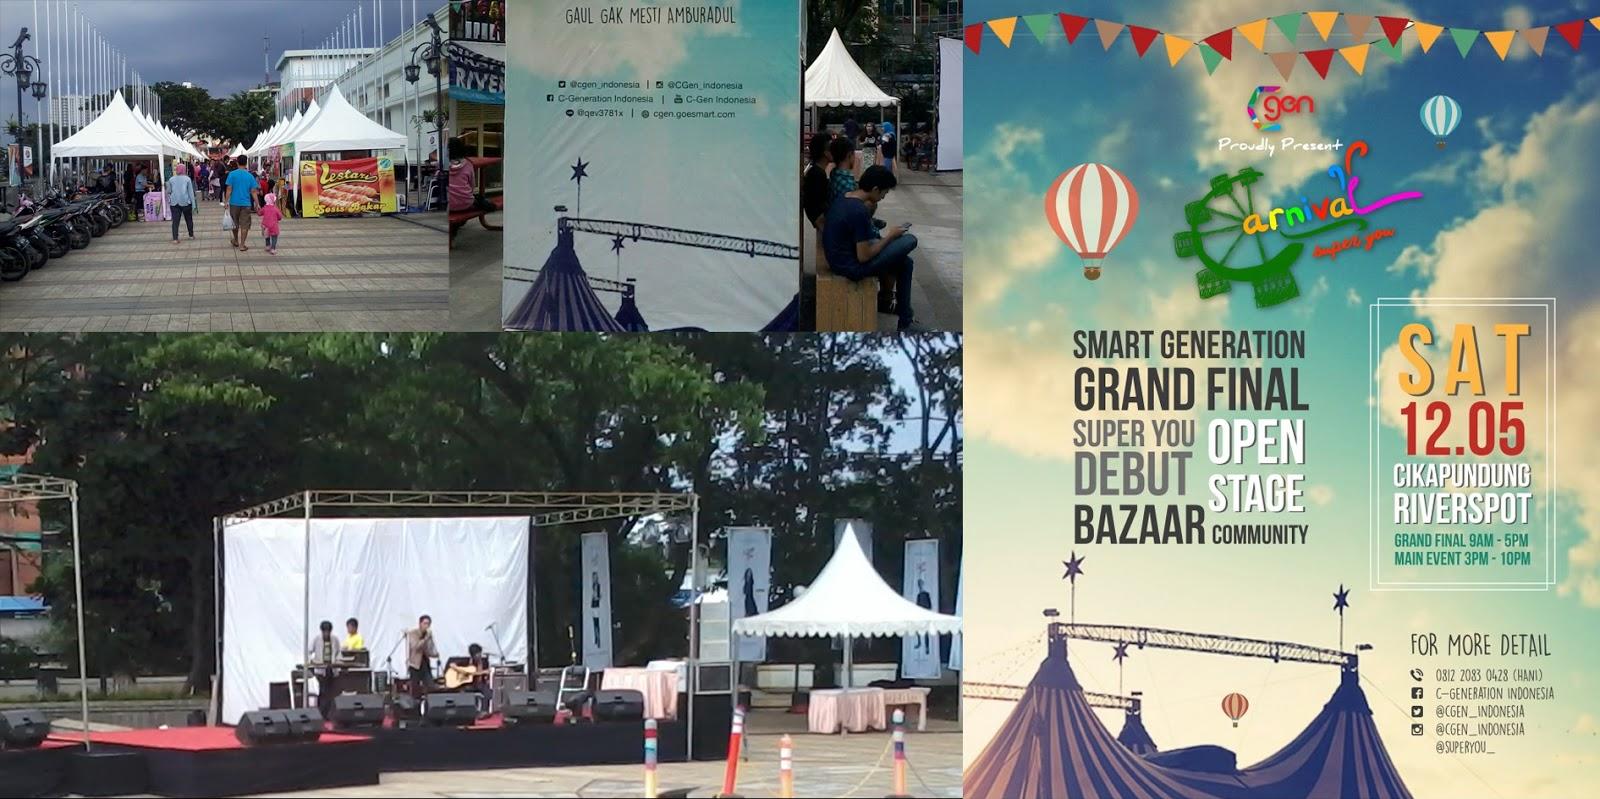 event Super You Carnival Cikapundung